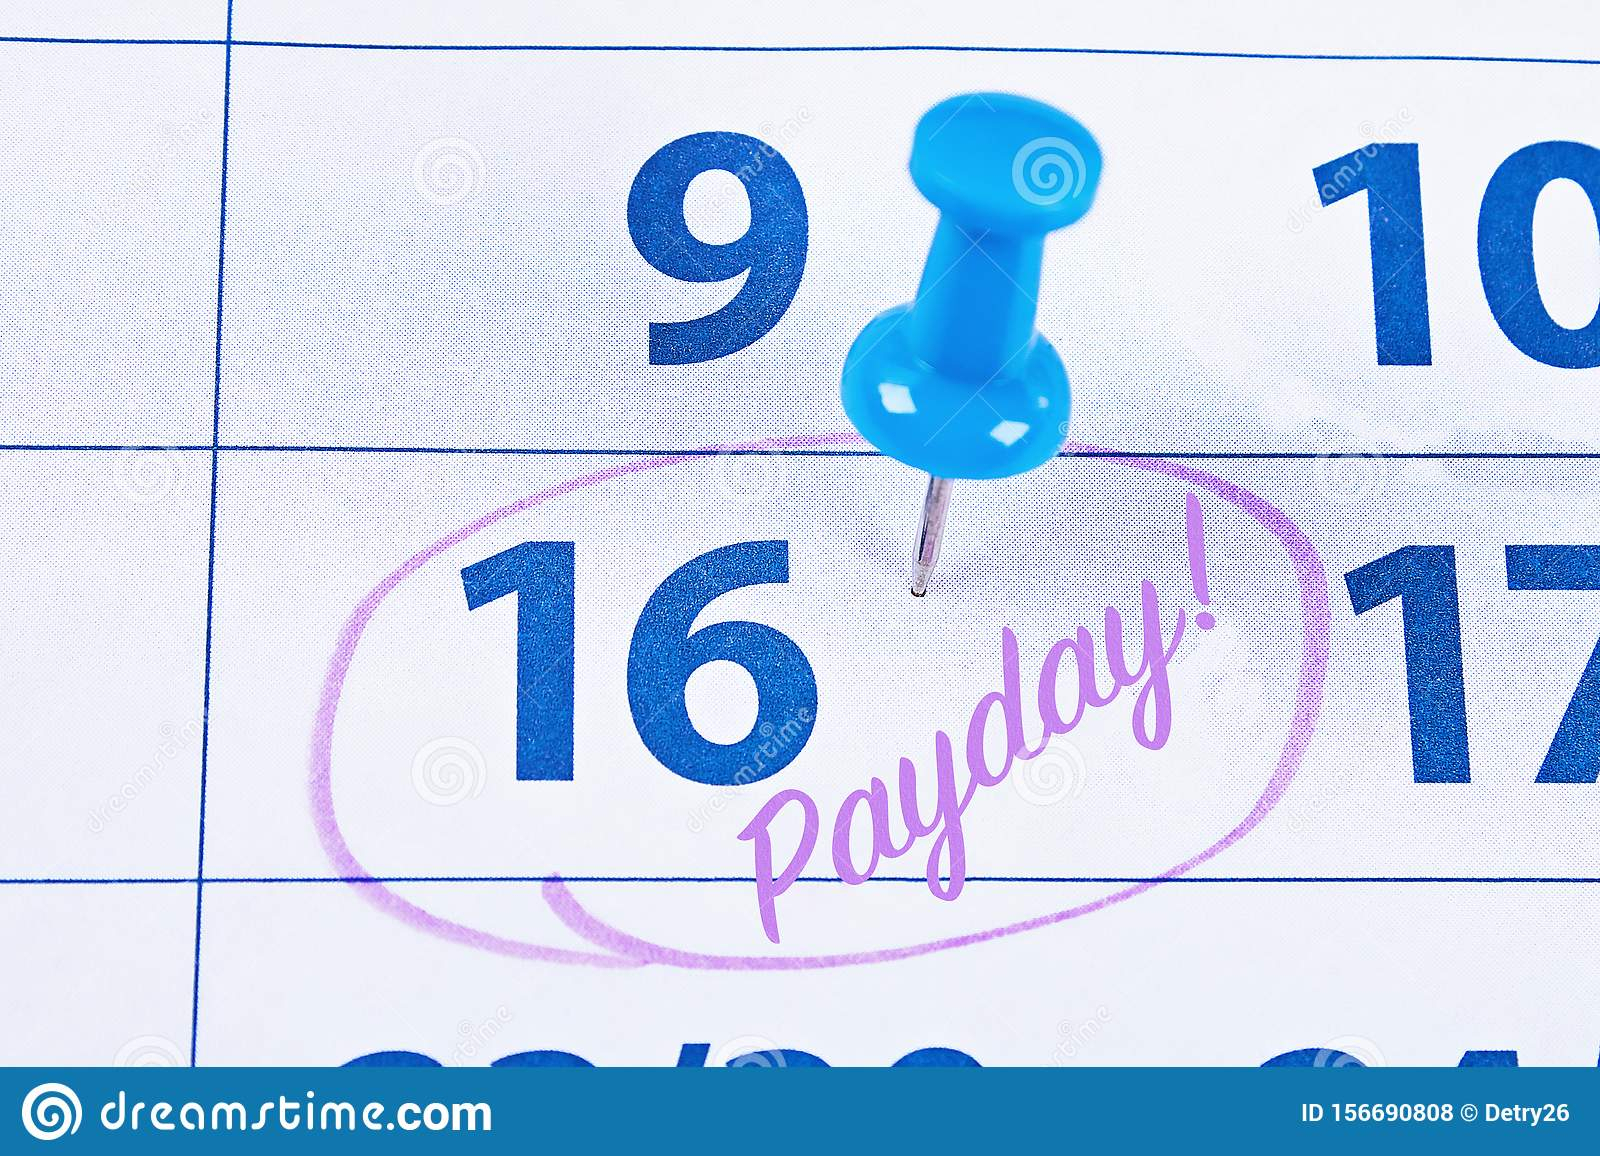 227 Payday Calendar Photos - Free & Royalty-Free Stock